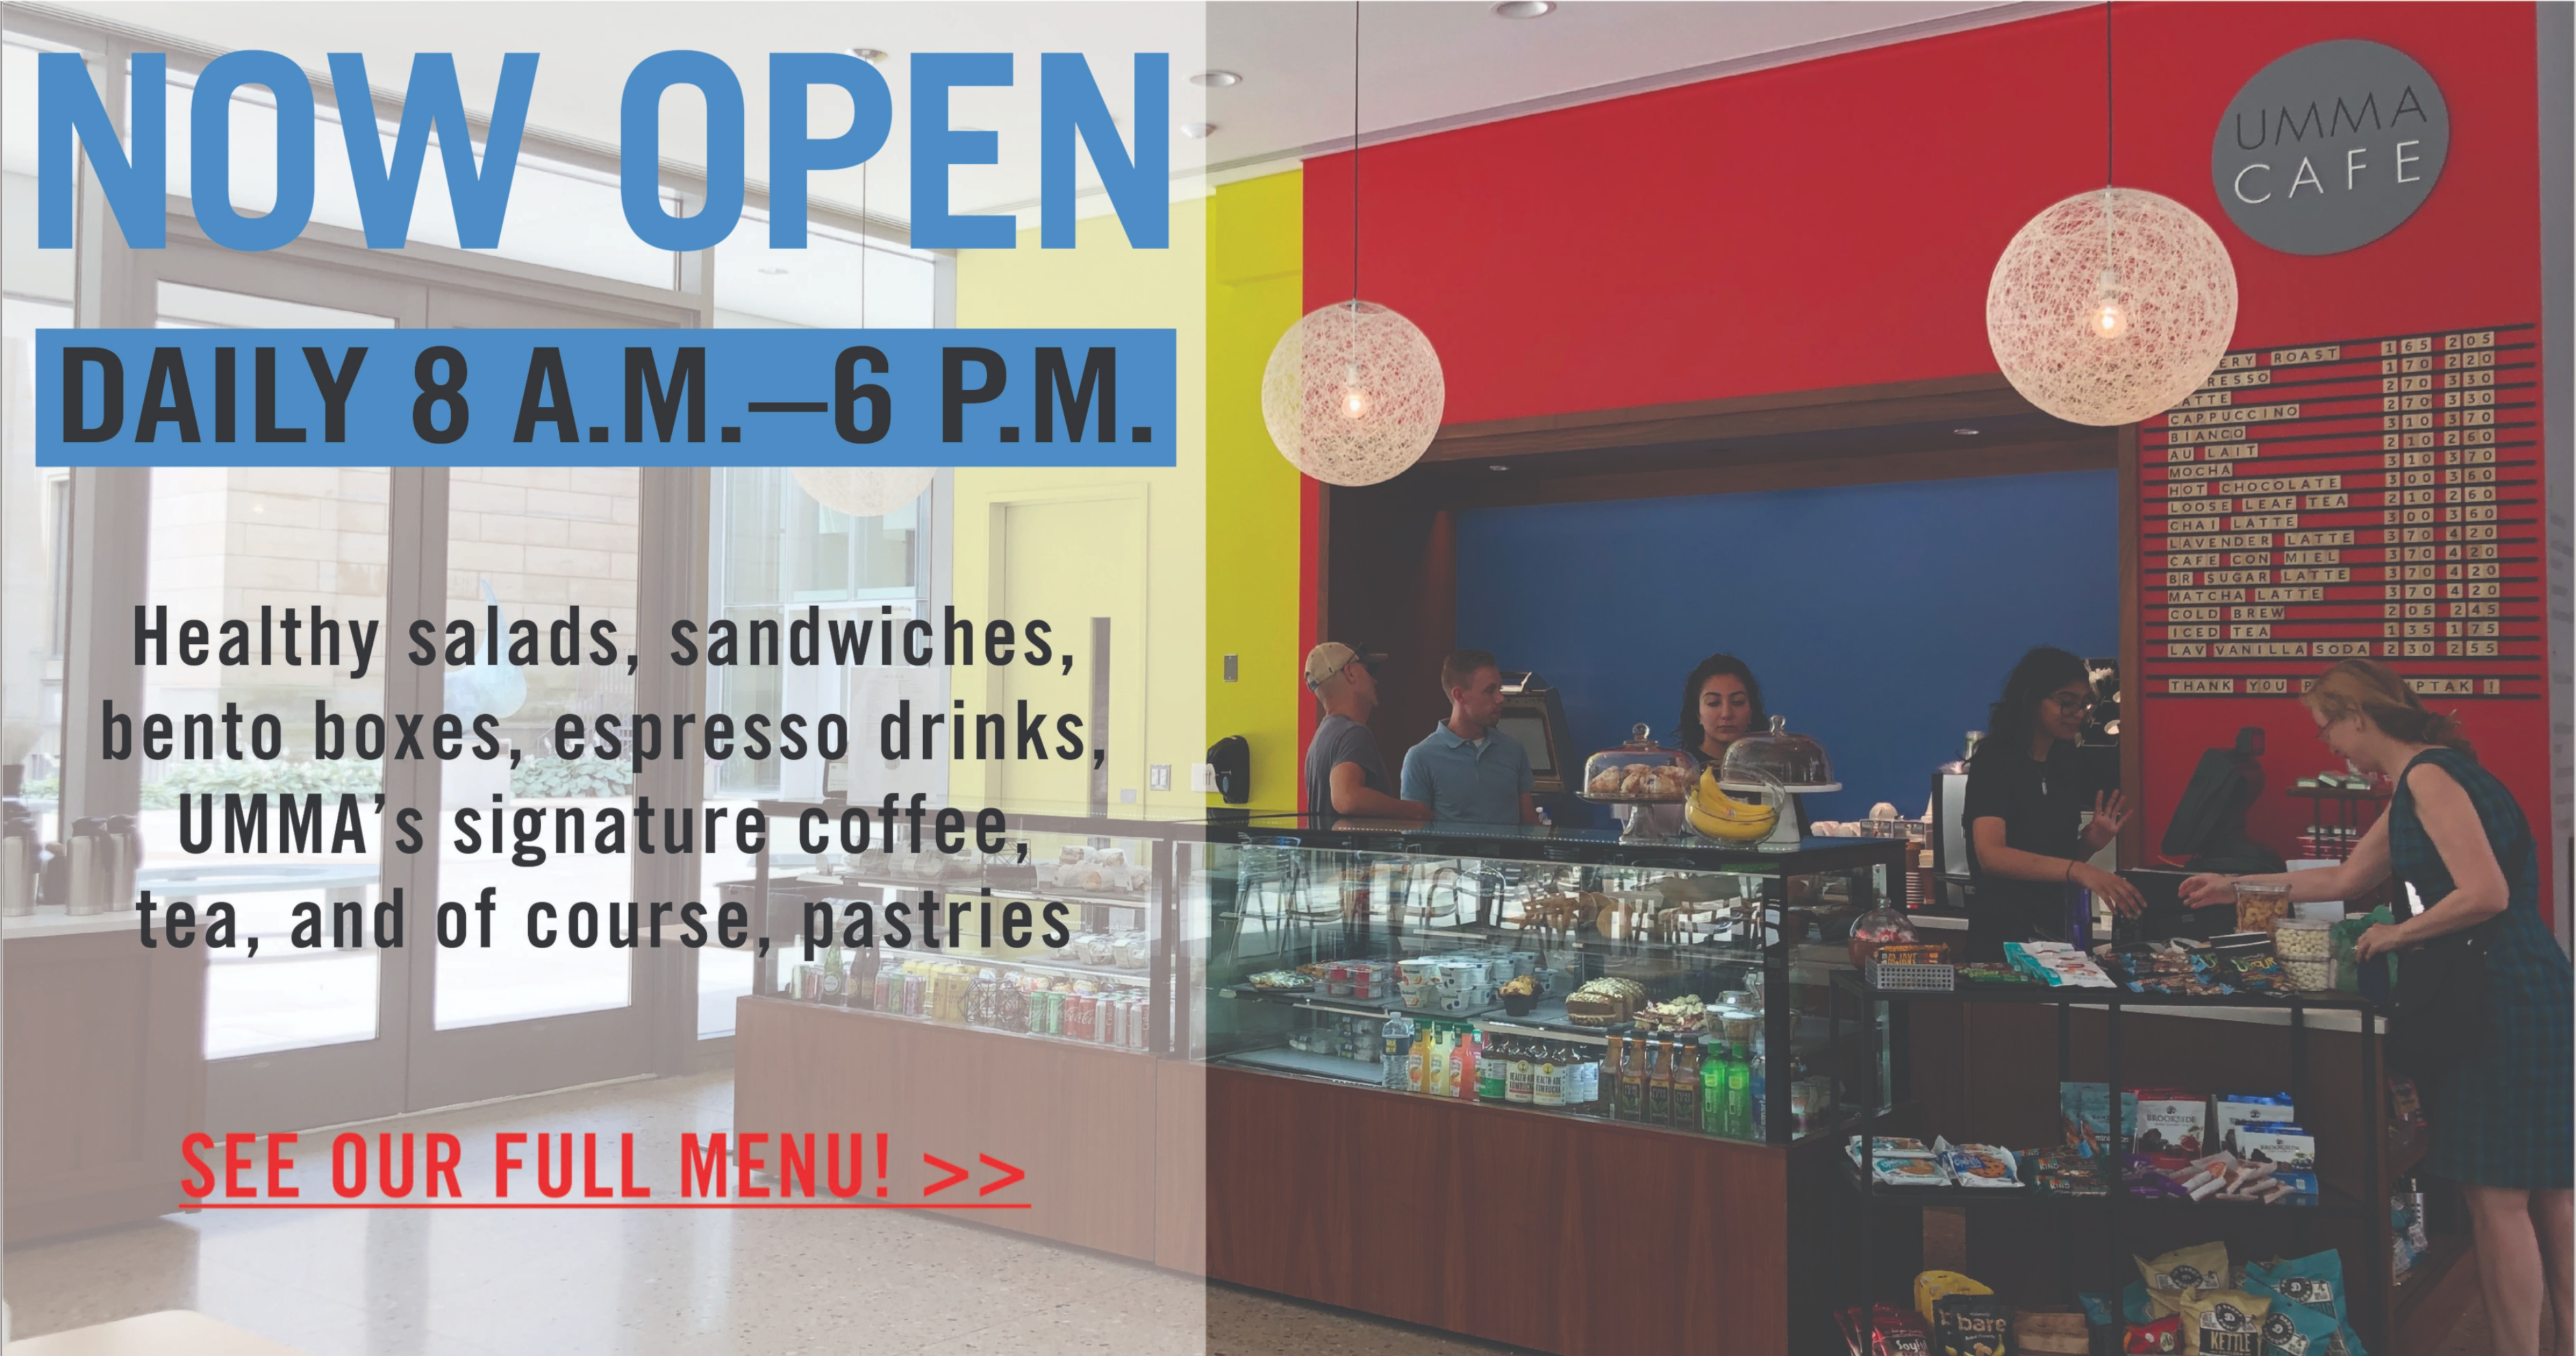 UMMA Cafe Now Open!